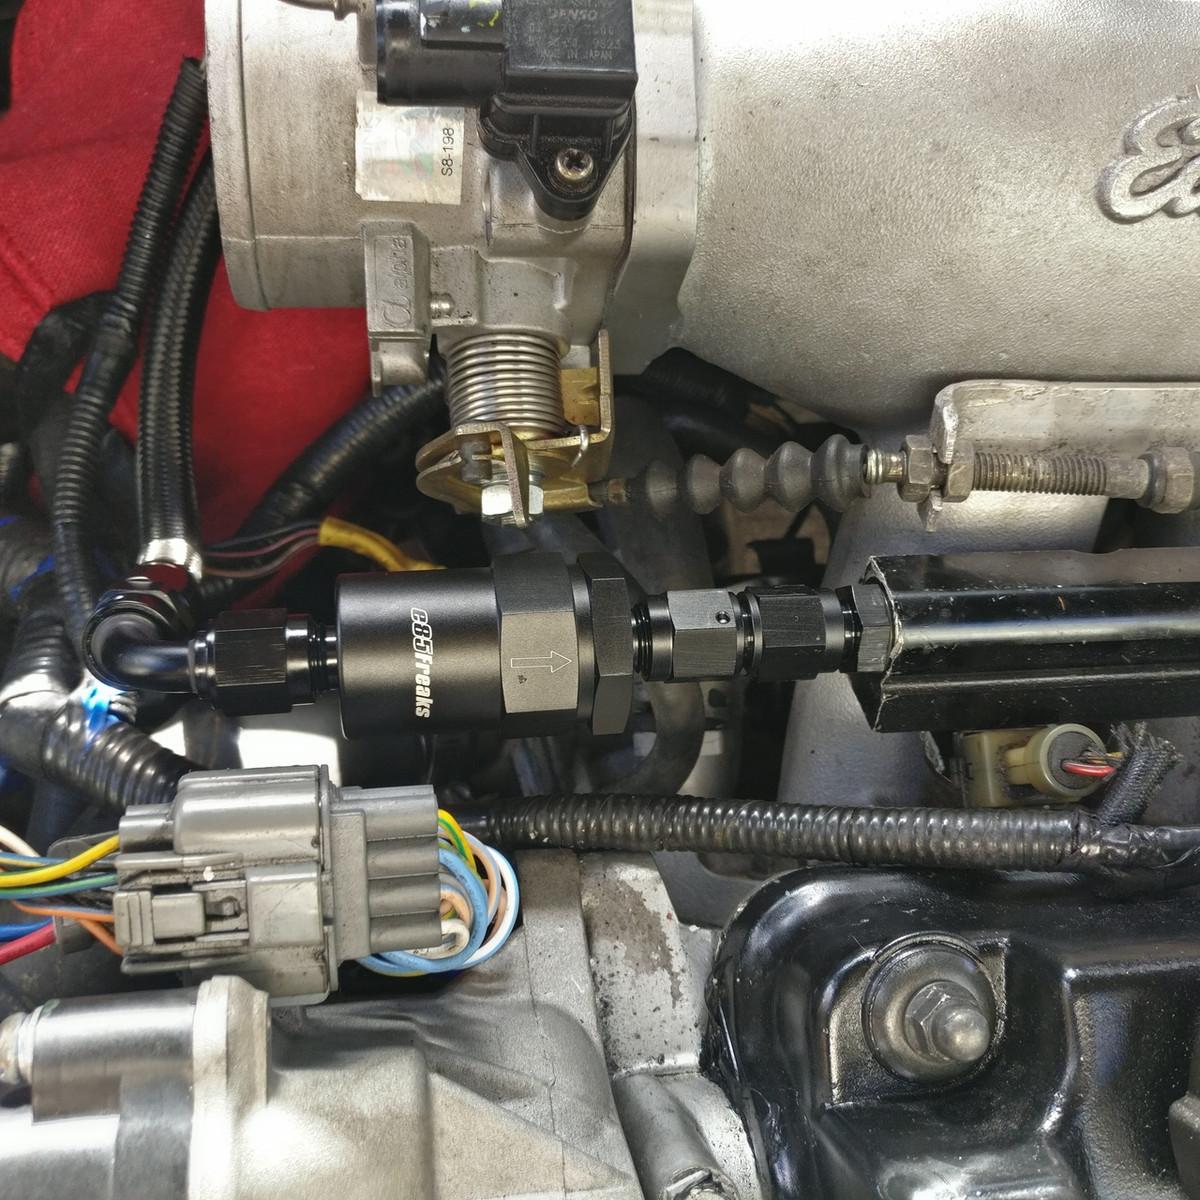 diy inline fuel filter civic wiring diagram expert diy inline fuel filter civic [ 1200 x 1200 Pixel ]